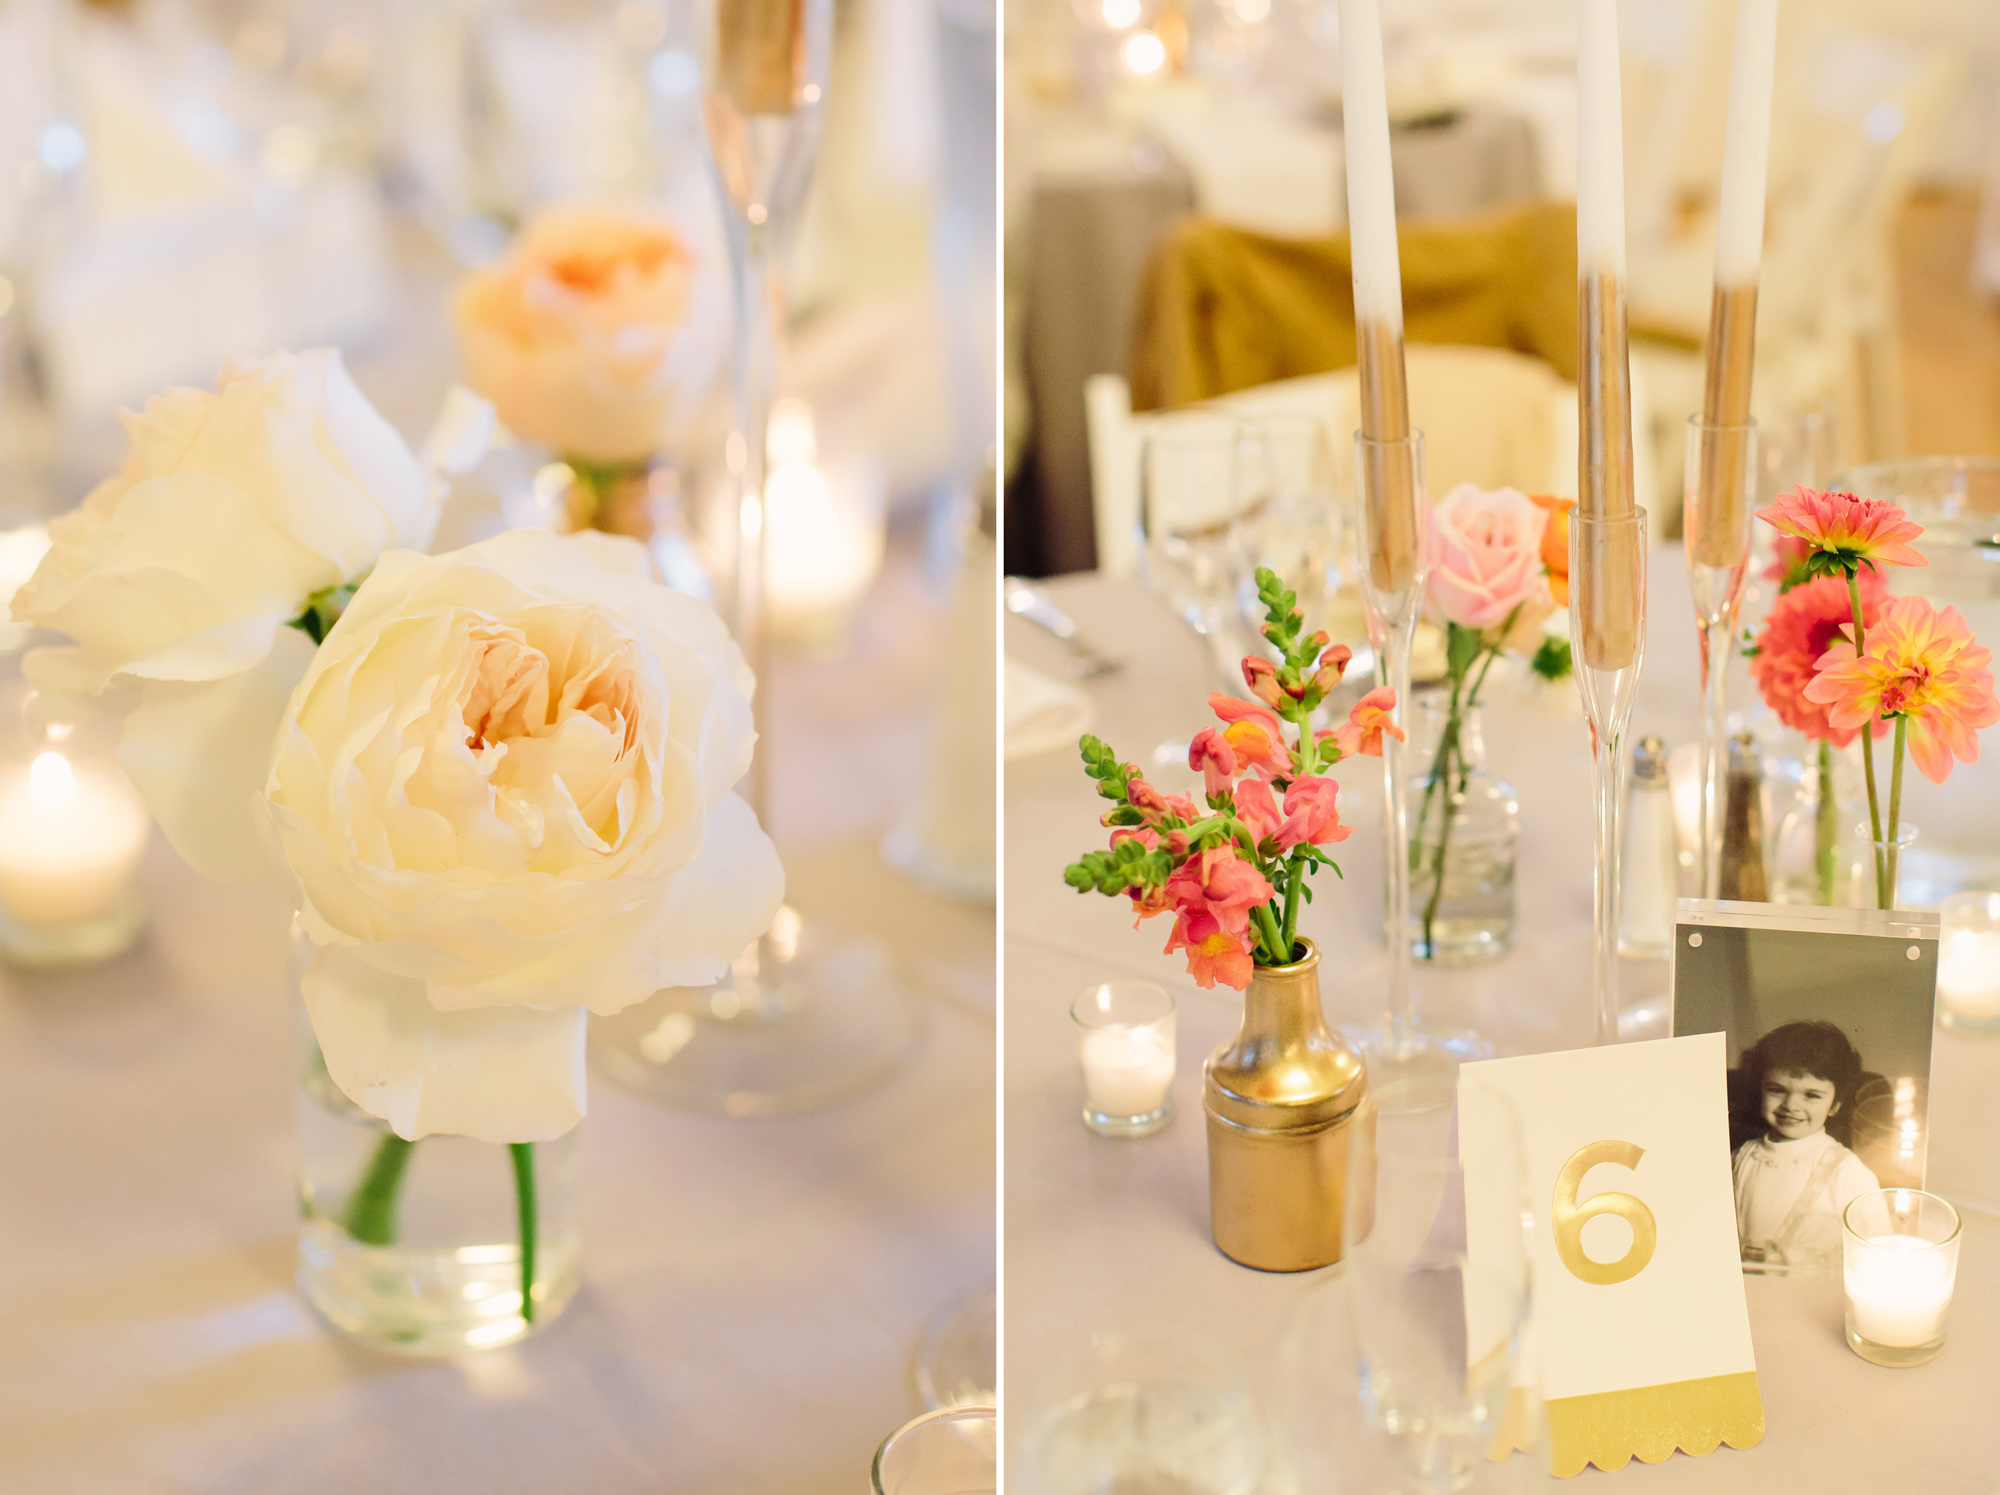 35_Kate_Sam_Picnic_House_Wedding_Brooklyn_NY_Tanya_Salazar_Photography.jpg